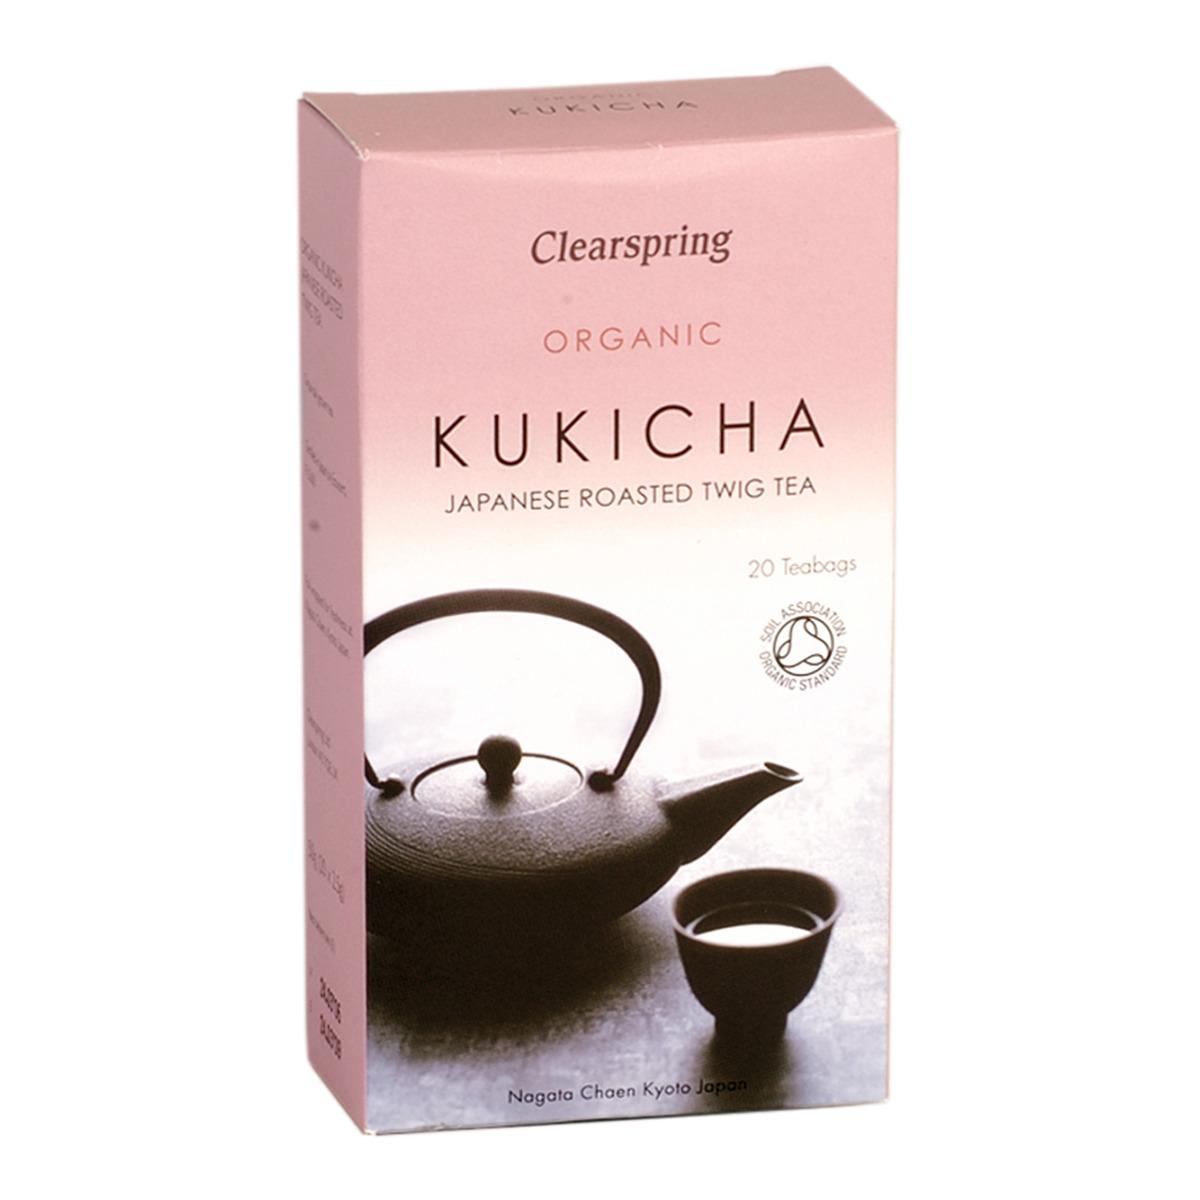 Té japonés Kukicha ecológico Clearspring